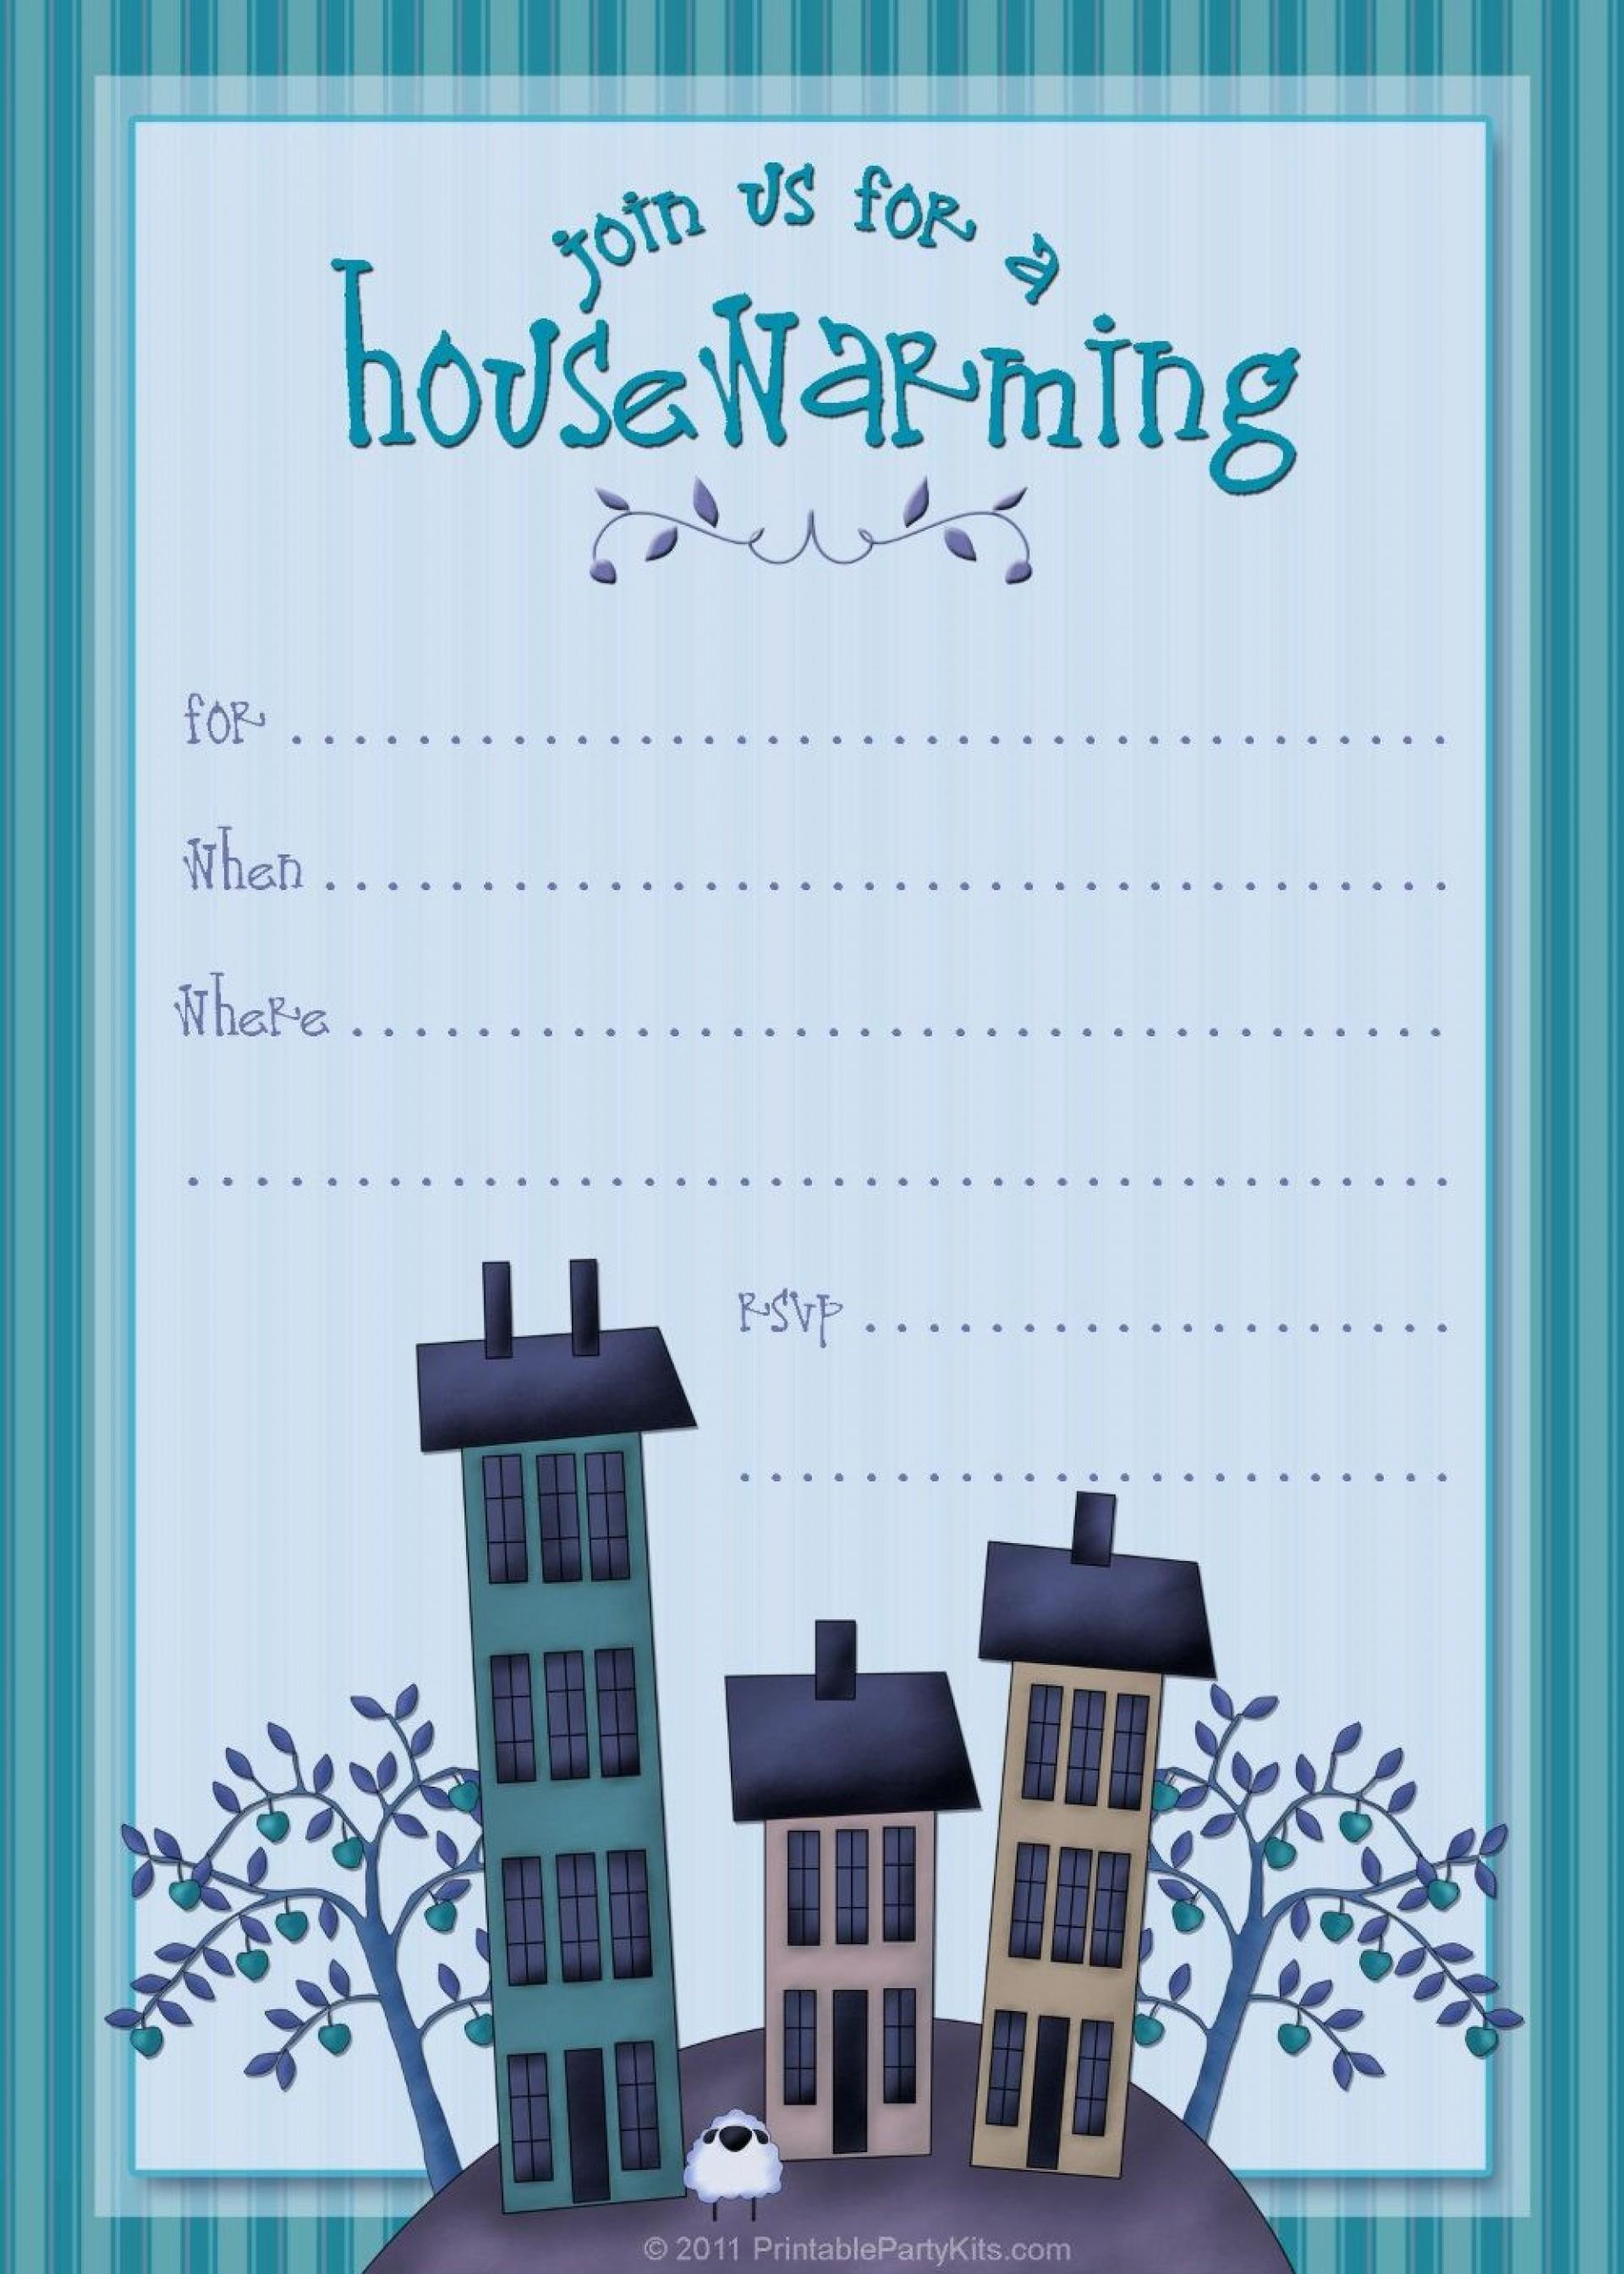 003 Shocking Free Housewarming Invitation Template Photo  Templates Printable India Video Download1920